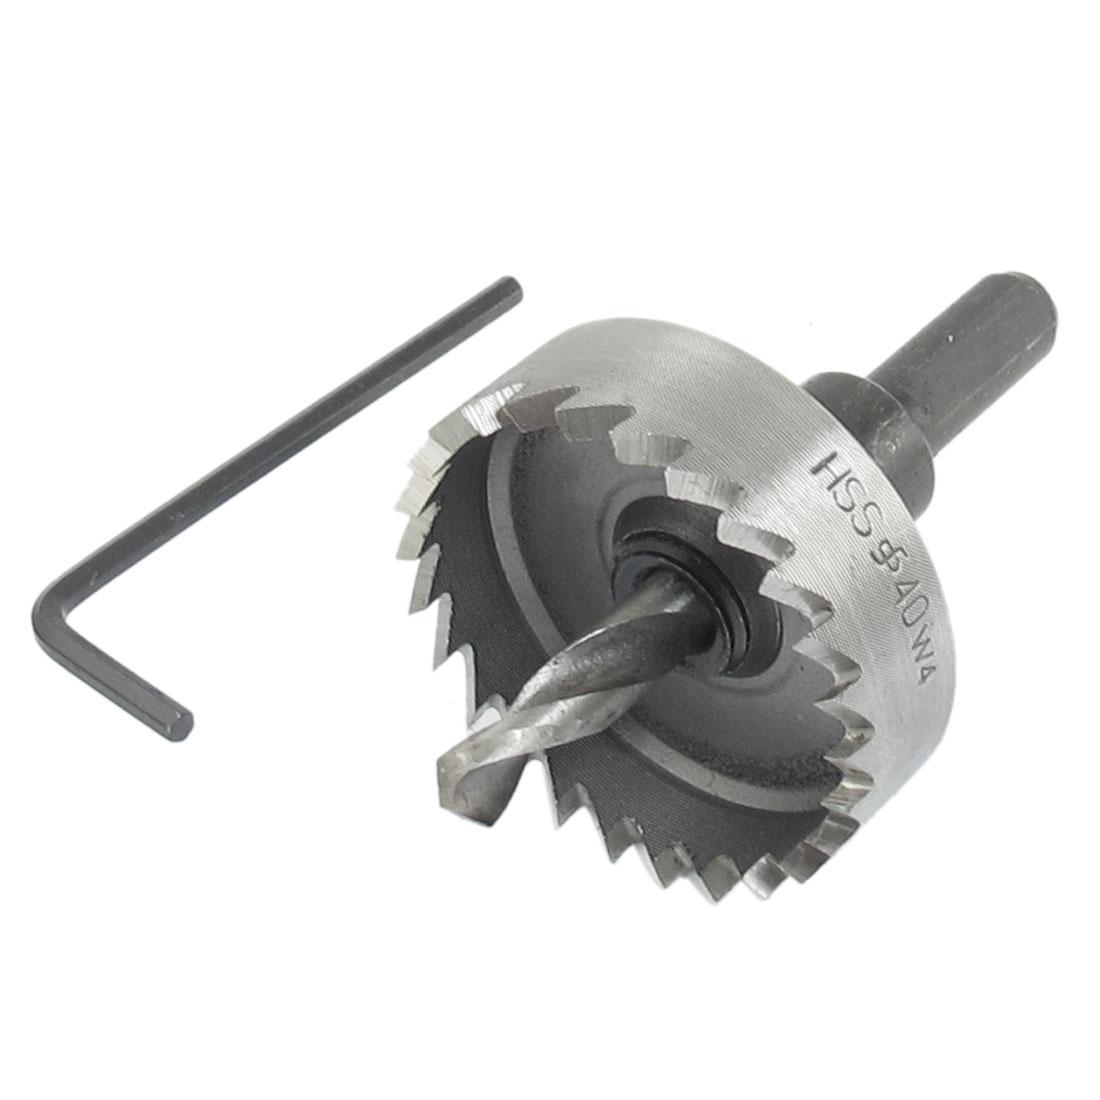 HSS Triangle Shank Twist Drill Bit Iron Cutting 40mm Hole Saw